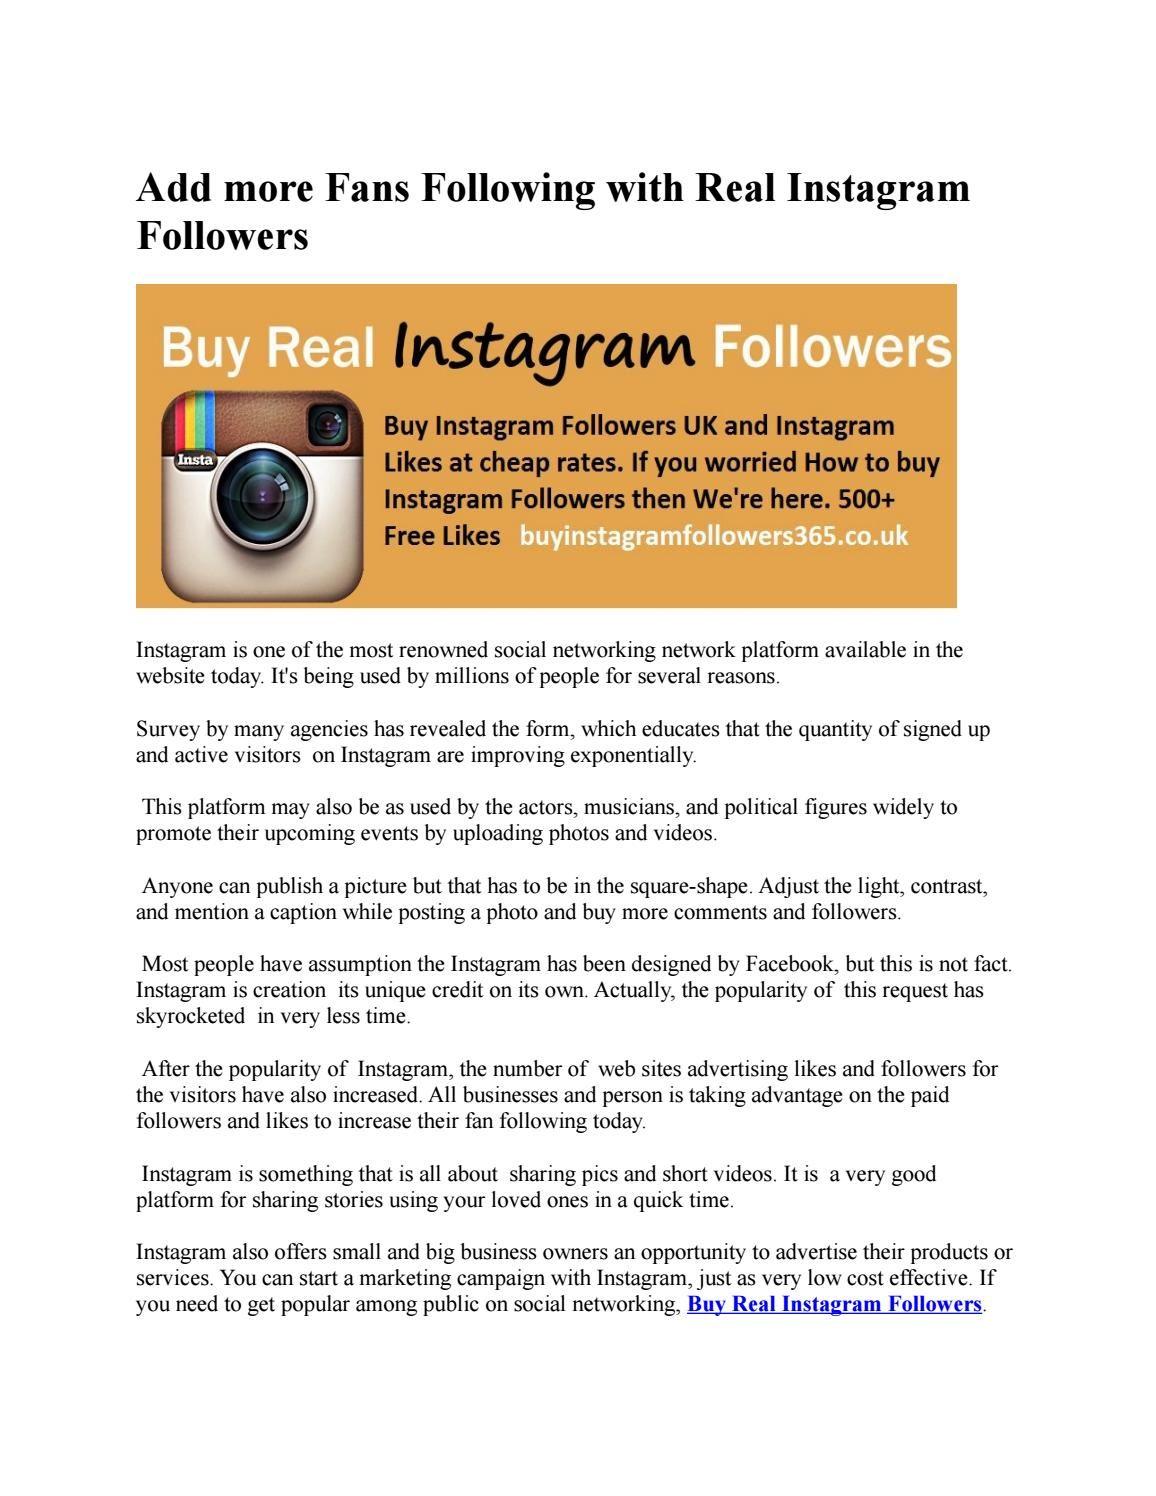 Buy Instagram Followers UK | BuyInstagramFollwoers365 Co Uk